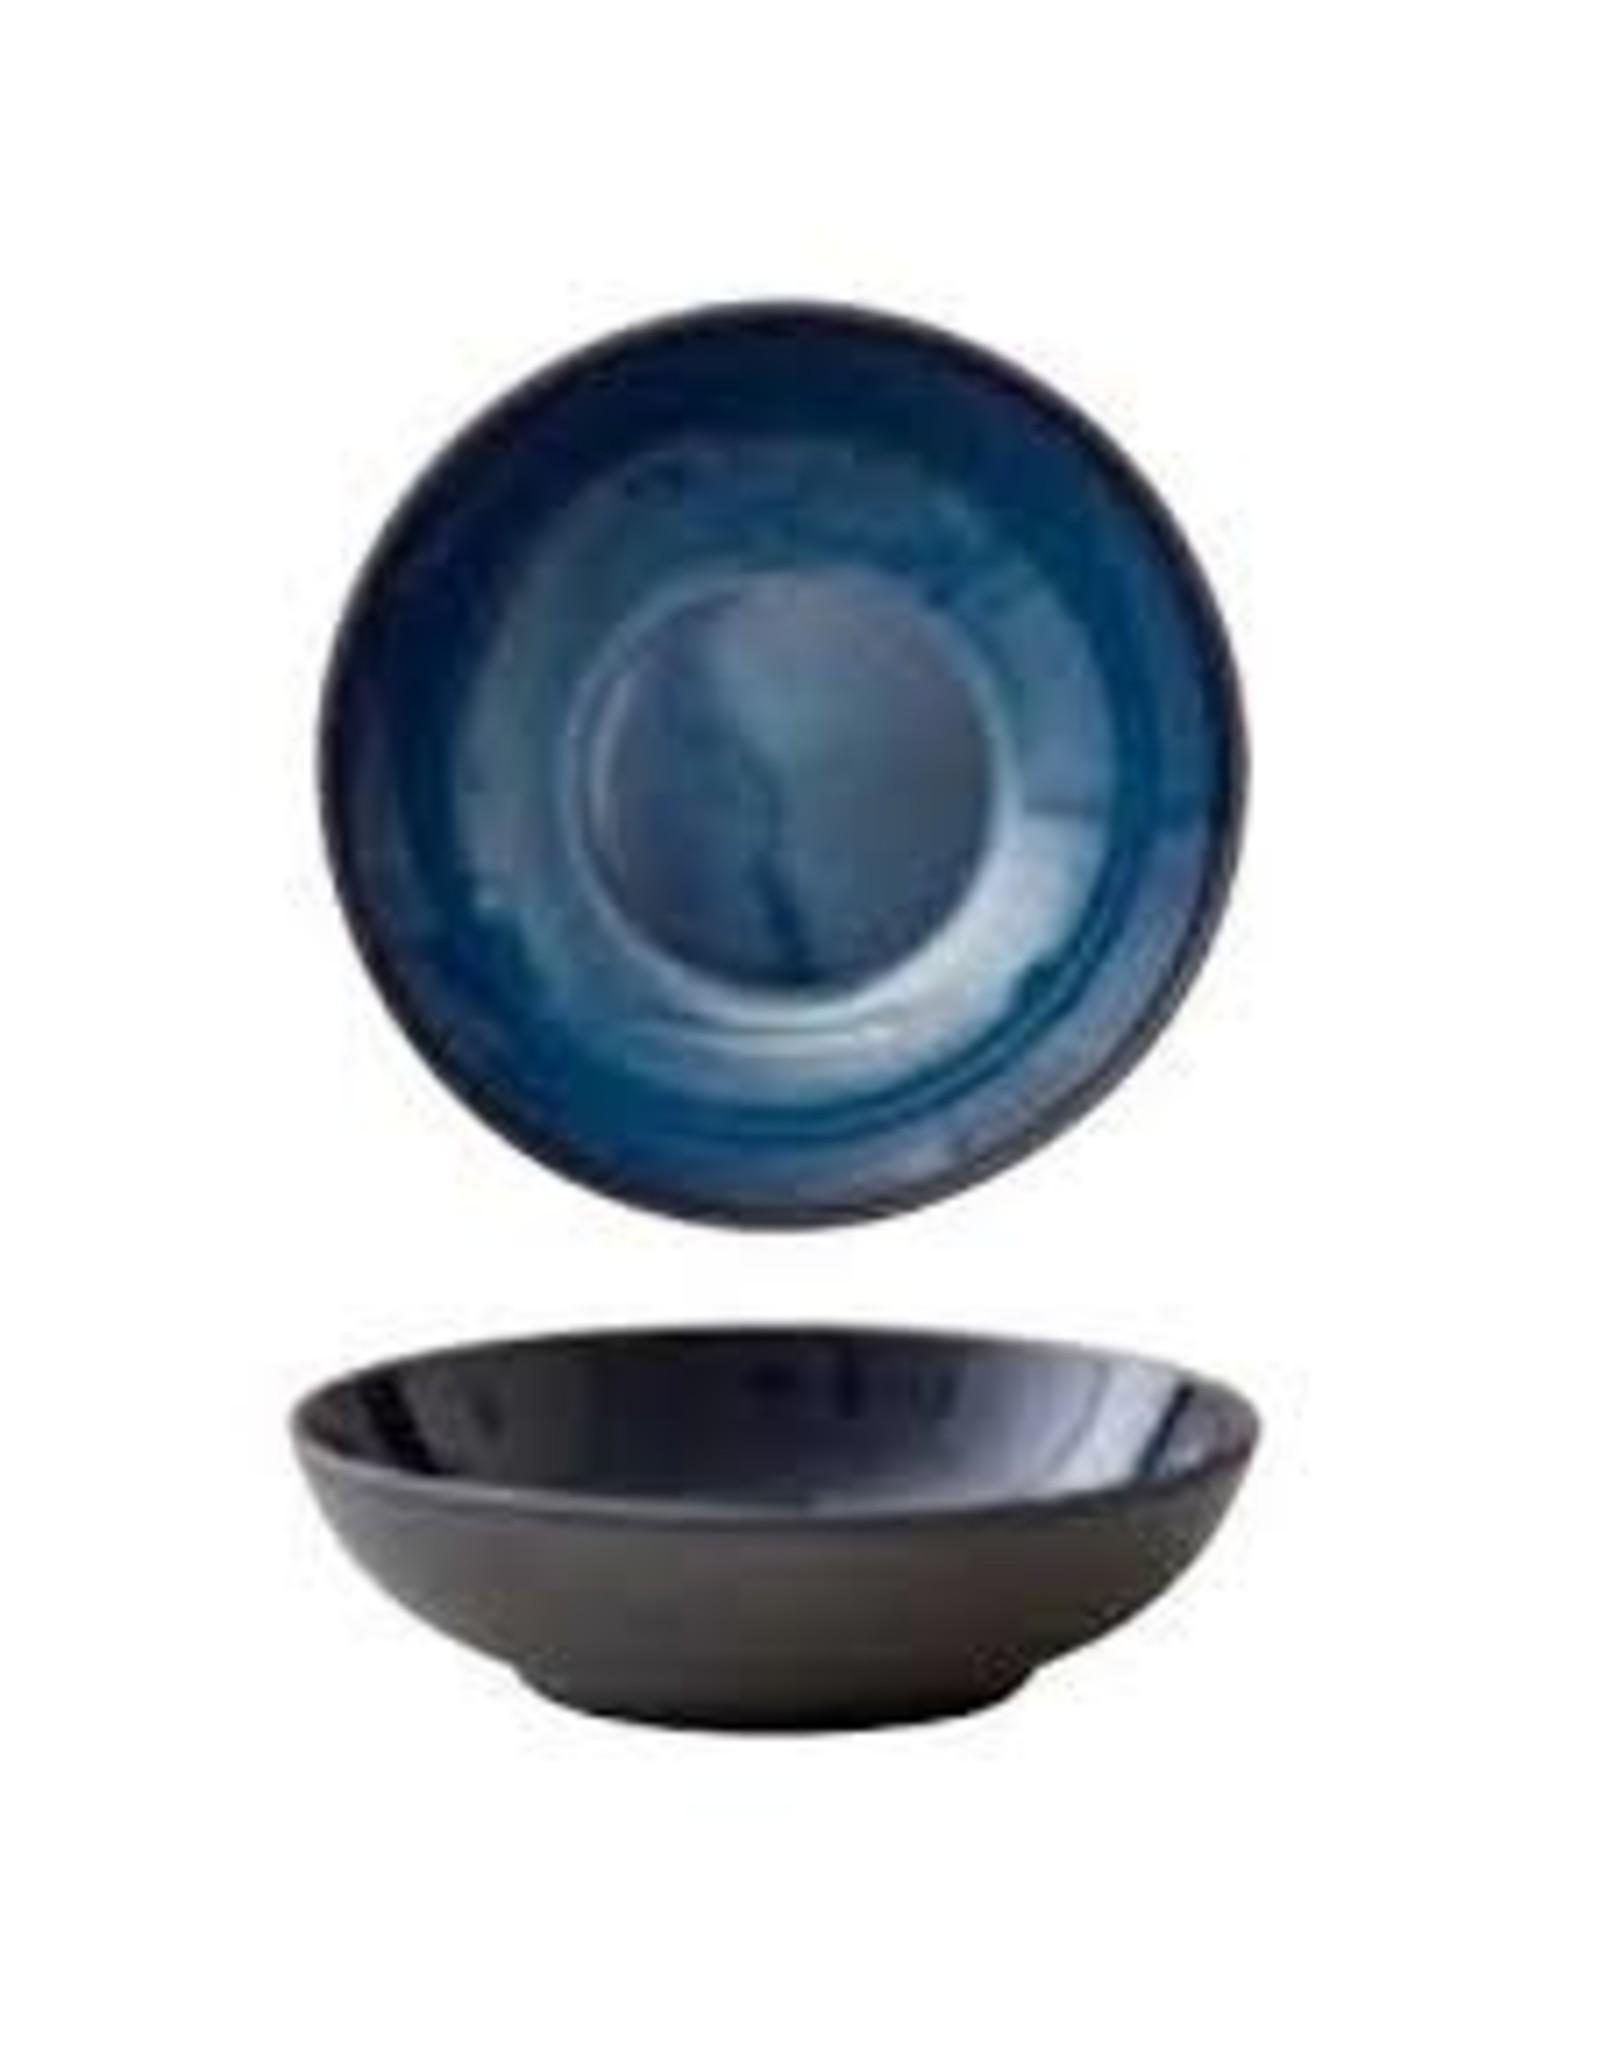 BITZ BITZ 011193 PASTA BOWL 20 CM BLACK/DARK BLUE